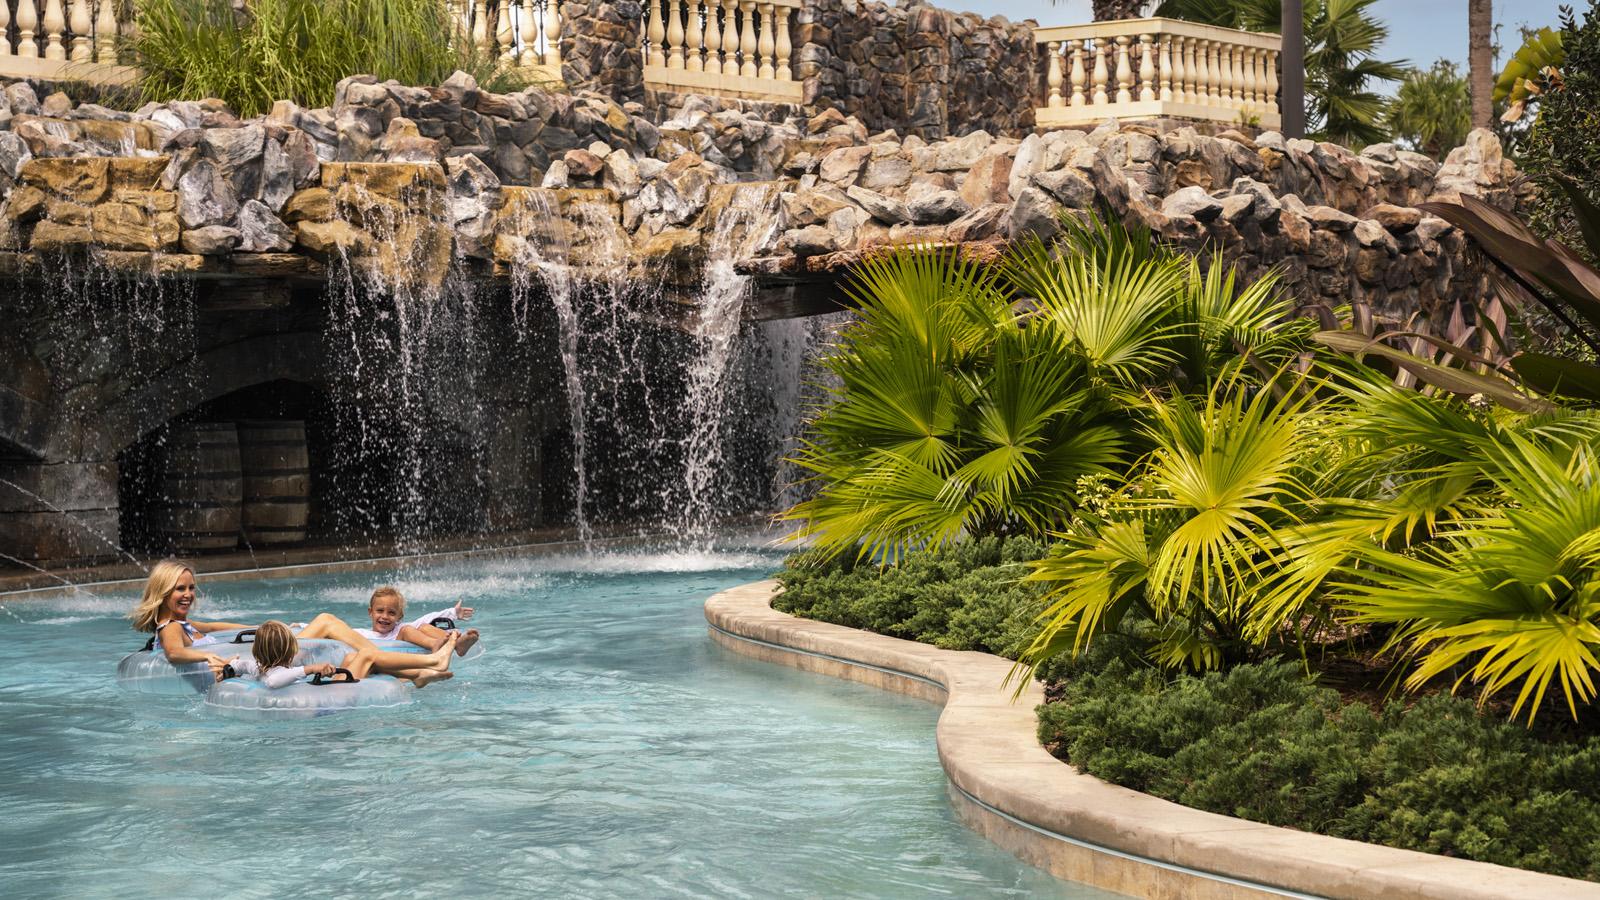 Four Seasons Resort Orlando Named Best Hotel and Best Resort in Orlando in  2021 U.S. News & World Report Best Hotels Rankings